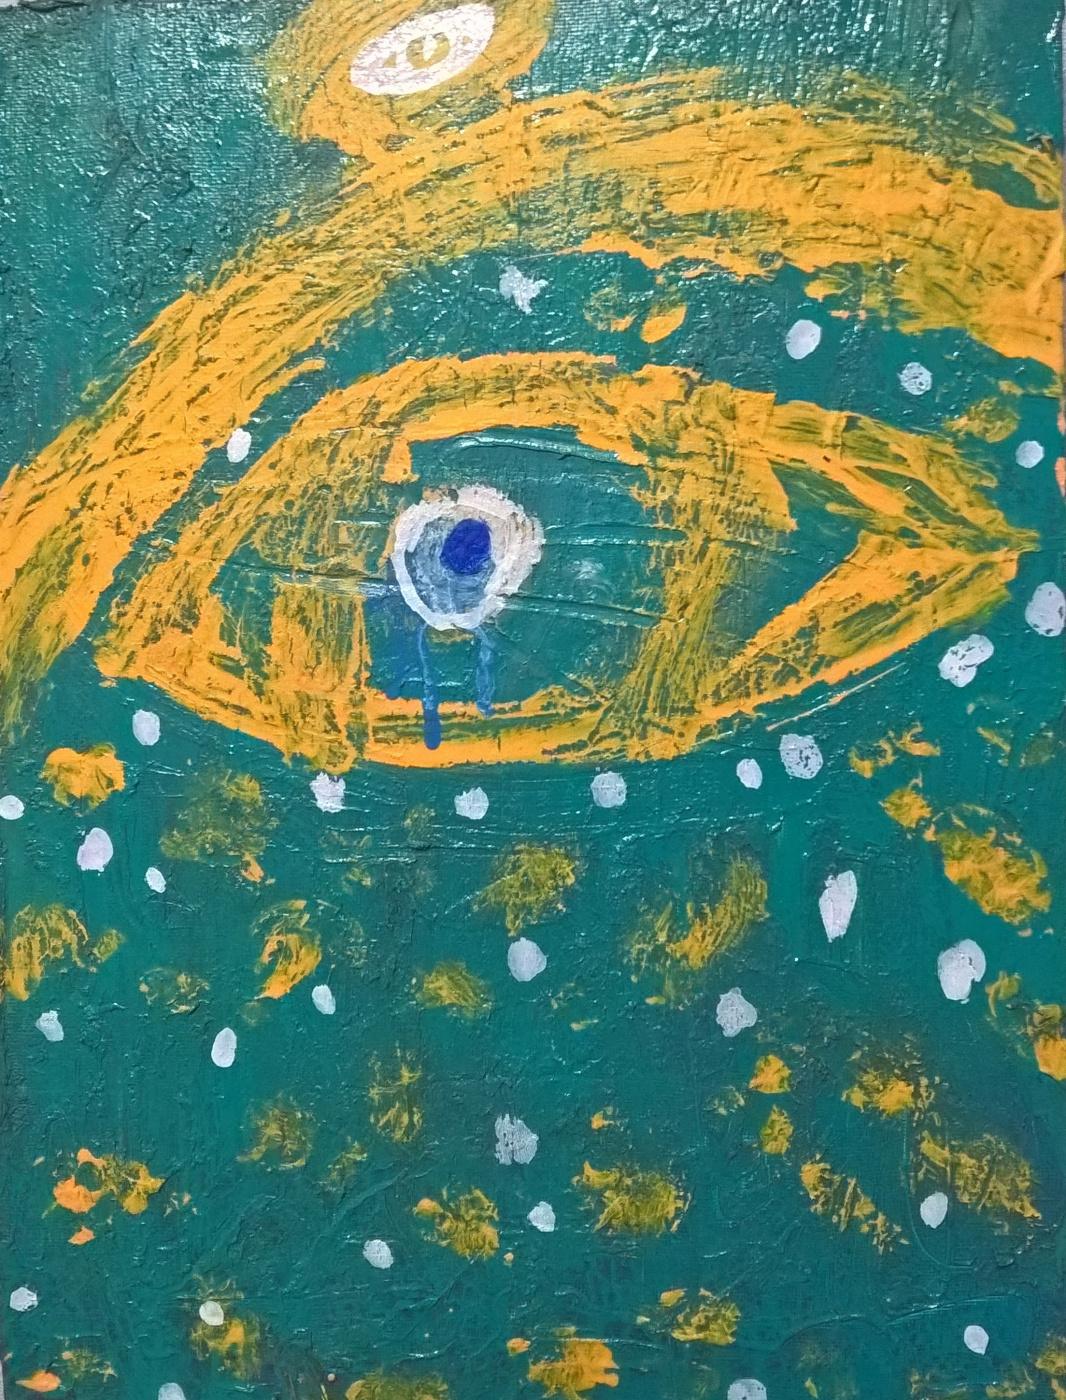 Алан Янович Орешинков. Eye